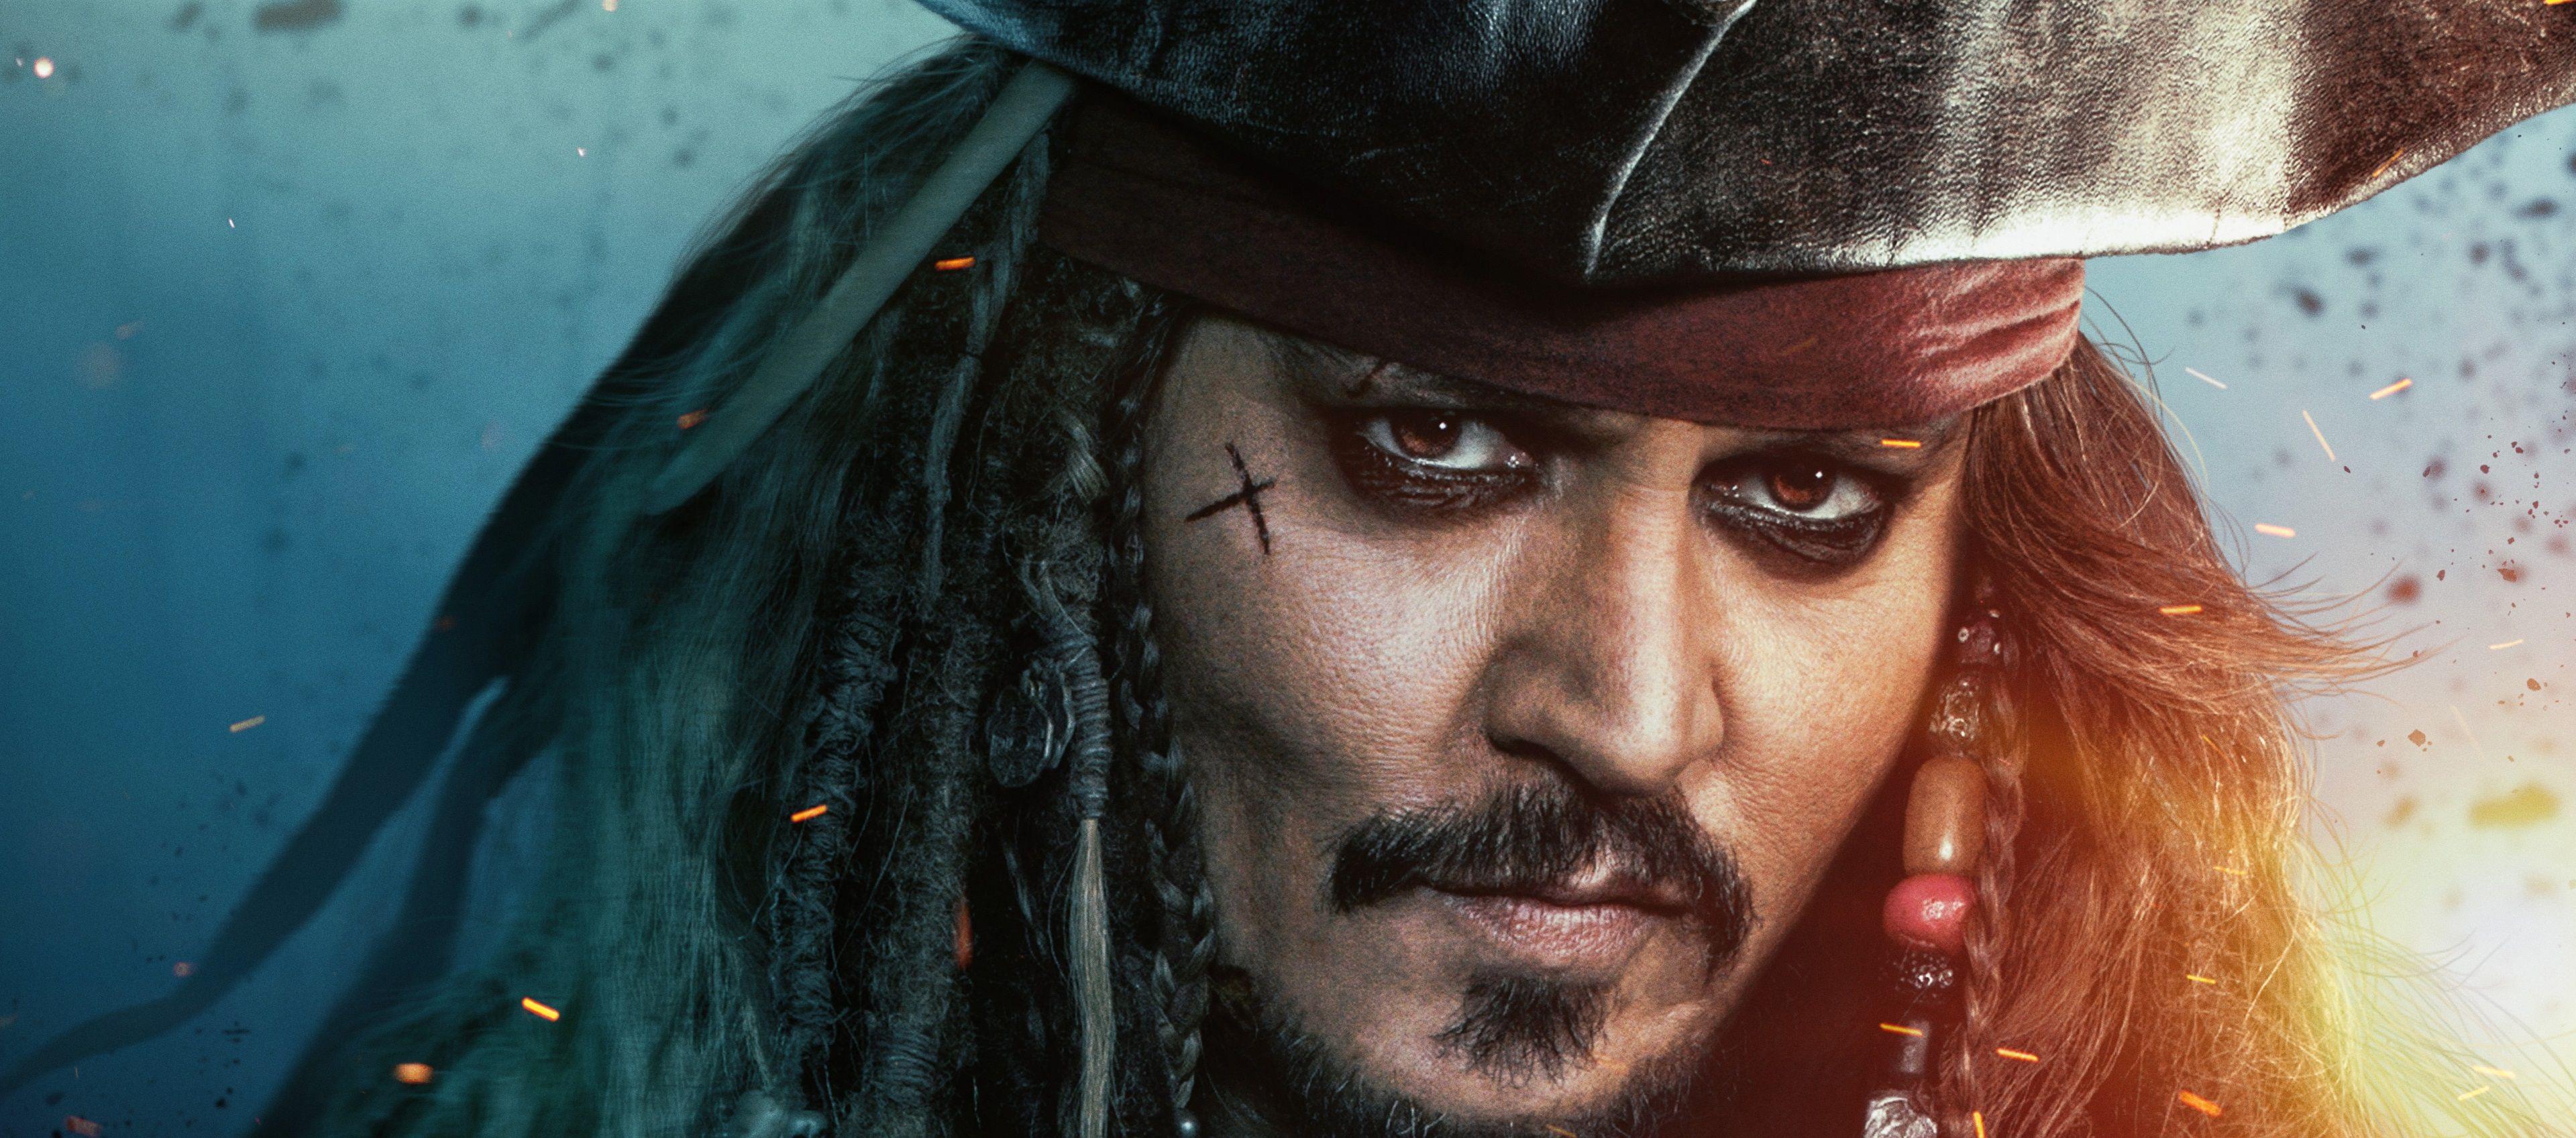 3840x1697 Johnny Depp 4k Wallpaper Download Captain Jack Sparrow Jack Sparrow Pirates Of The Caribbean